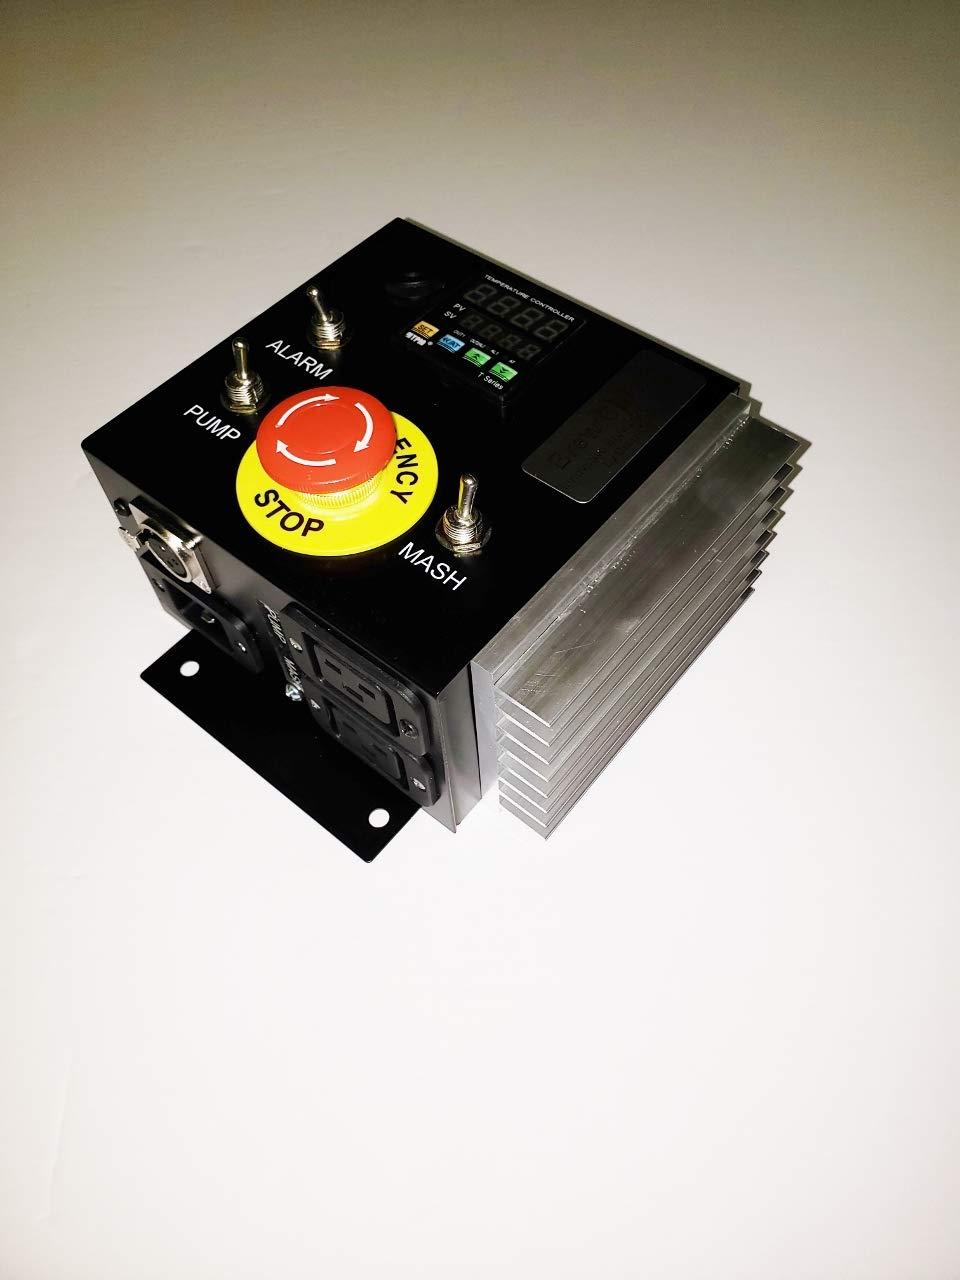 International 220/230/240v 50/60 Hz Mash Tun/RIMS (Recirculating Infusion Mash System) Tube Controller by Stir-Plate (Image #5)